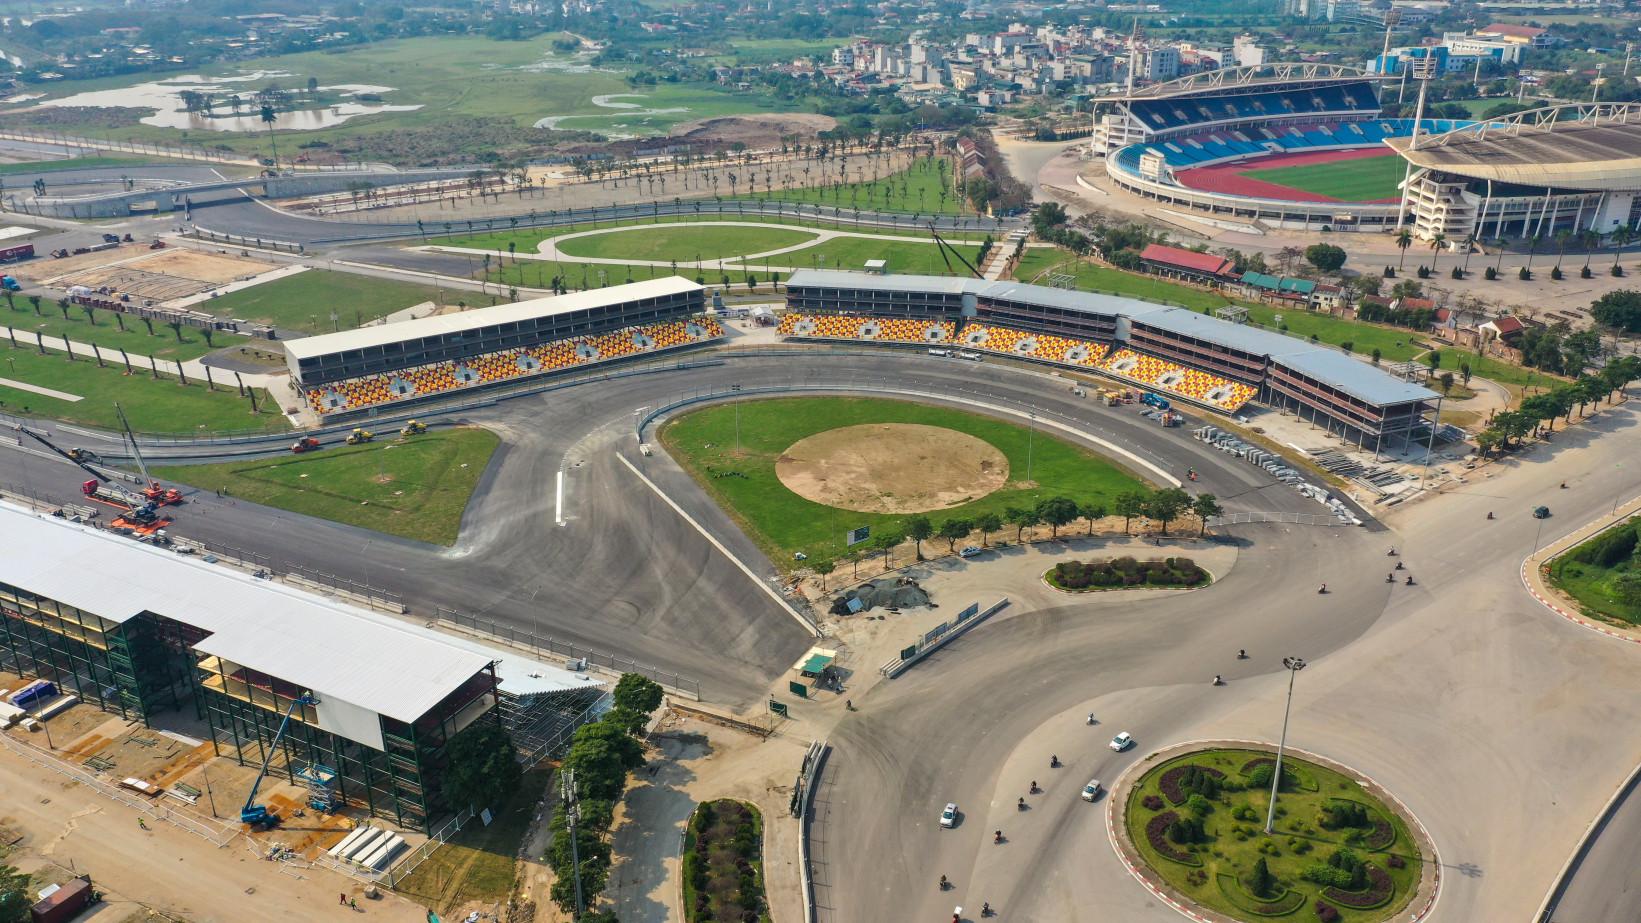 Vietnam Grand Prix Corporation